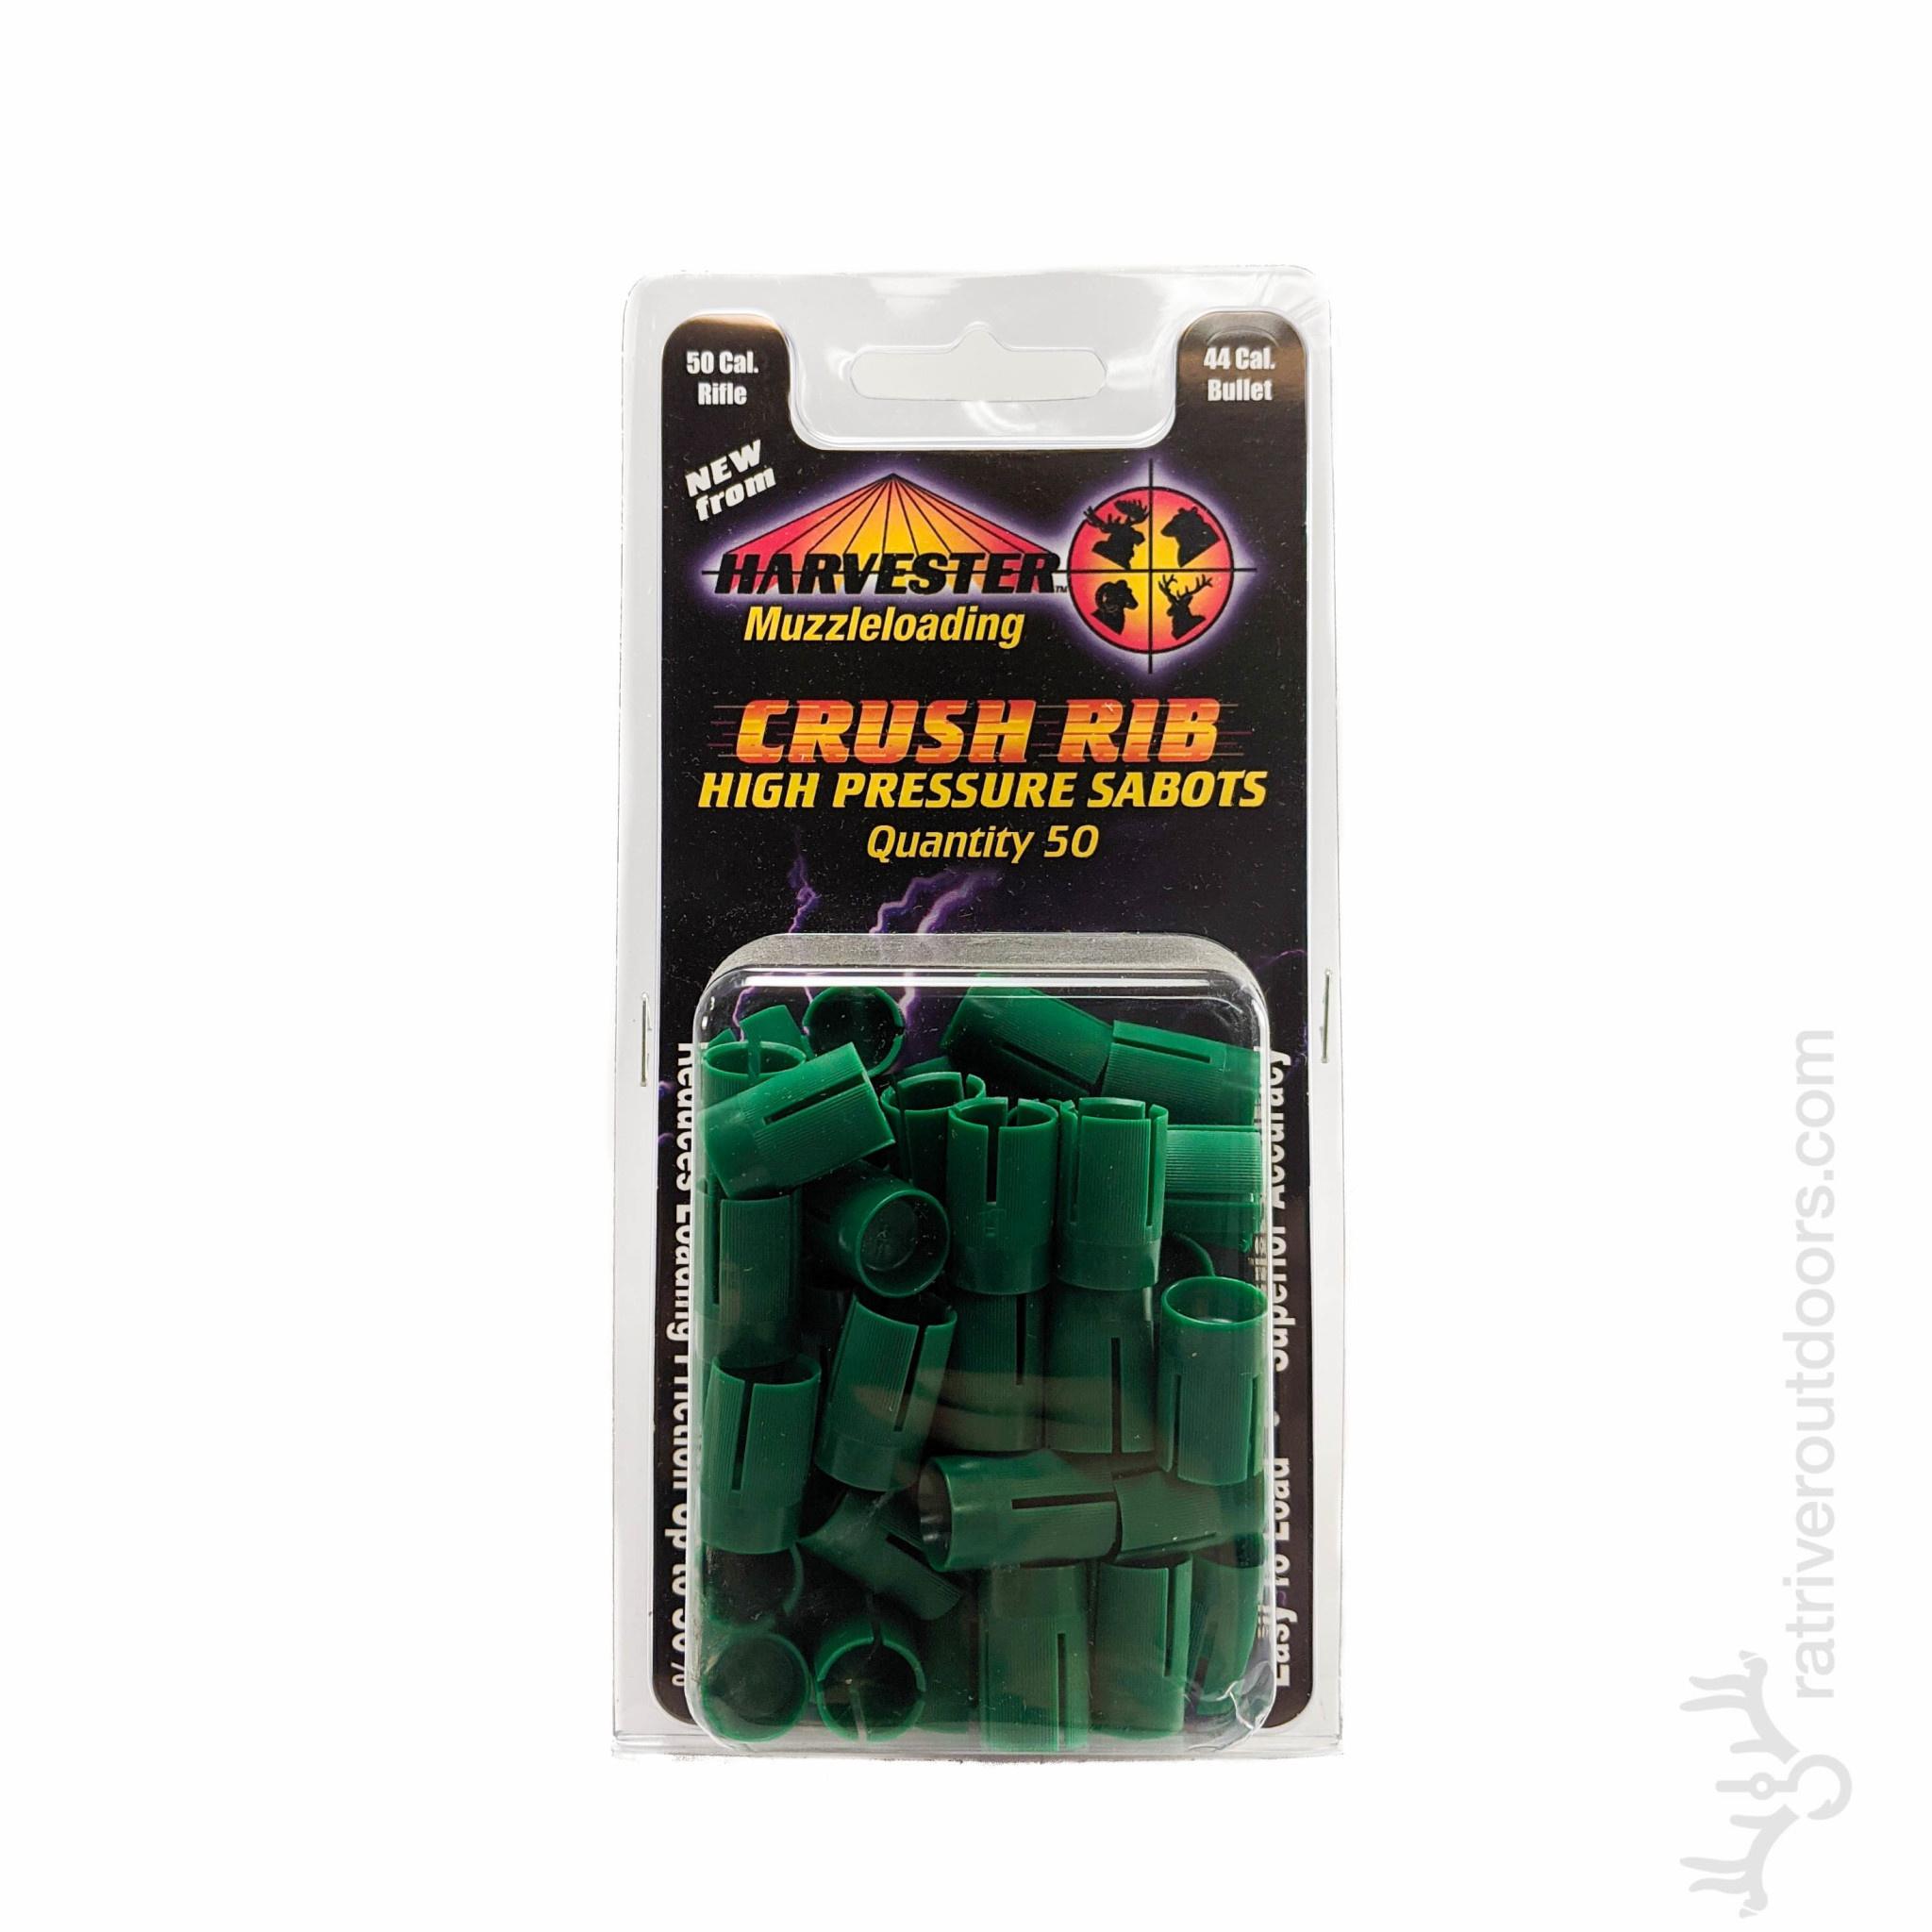 Harvester .50 to .45 Crush Rib High Pressure Sabots / Green (50pk)